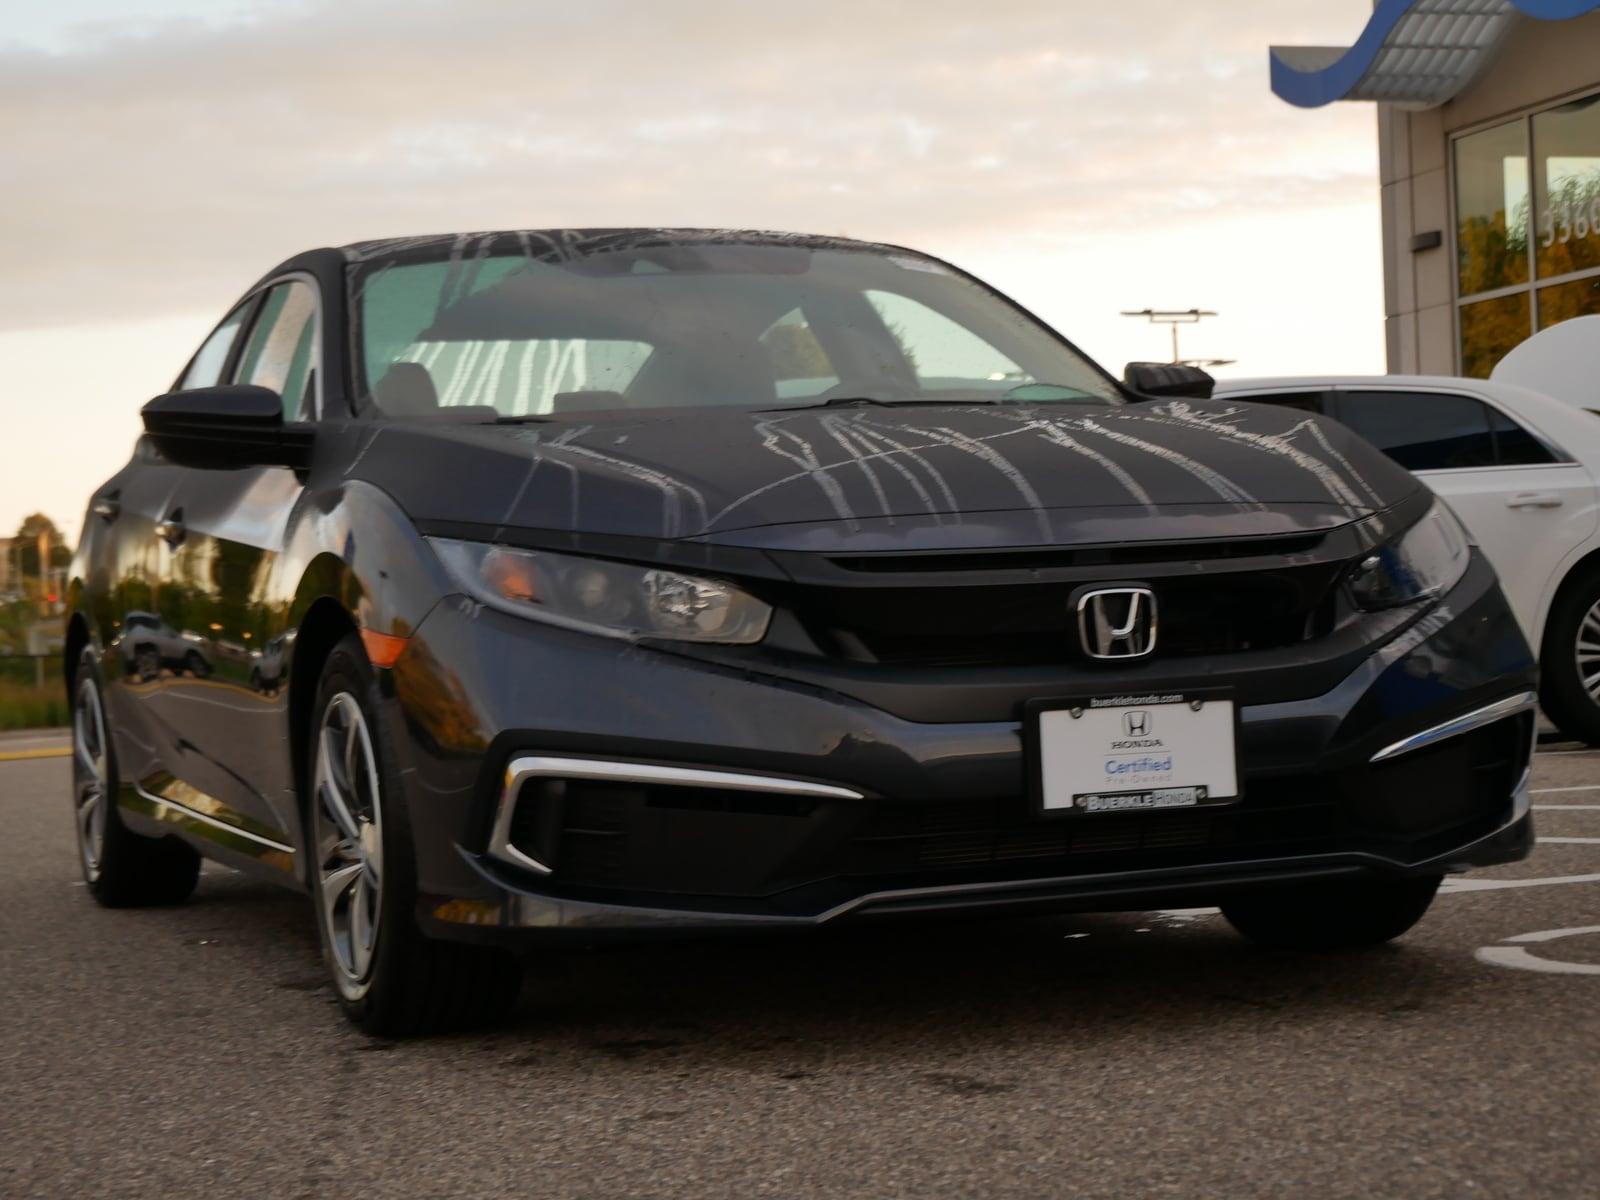 Certified 2019 Honda Civic LX with VIN 19XFC2F68KE019995 for sale in Saint Paul, Minnesota